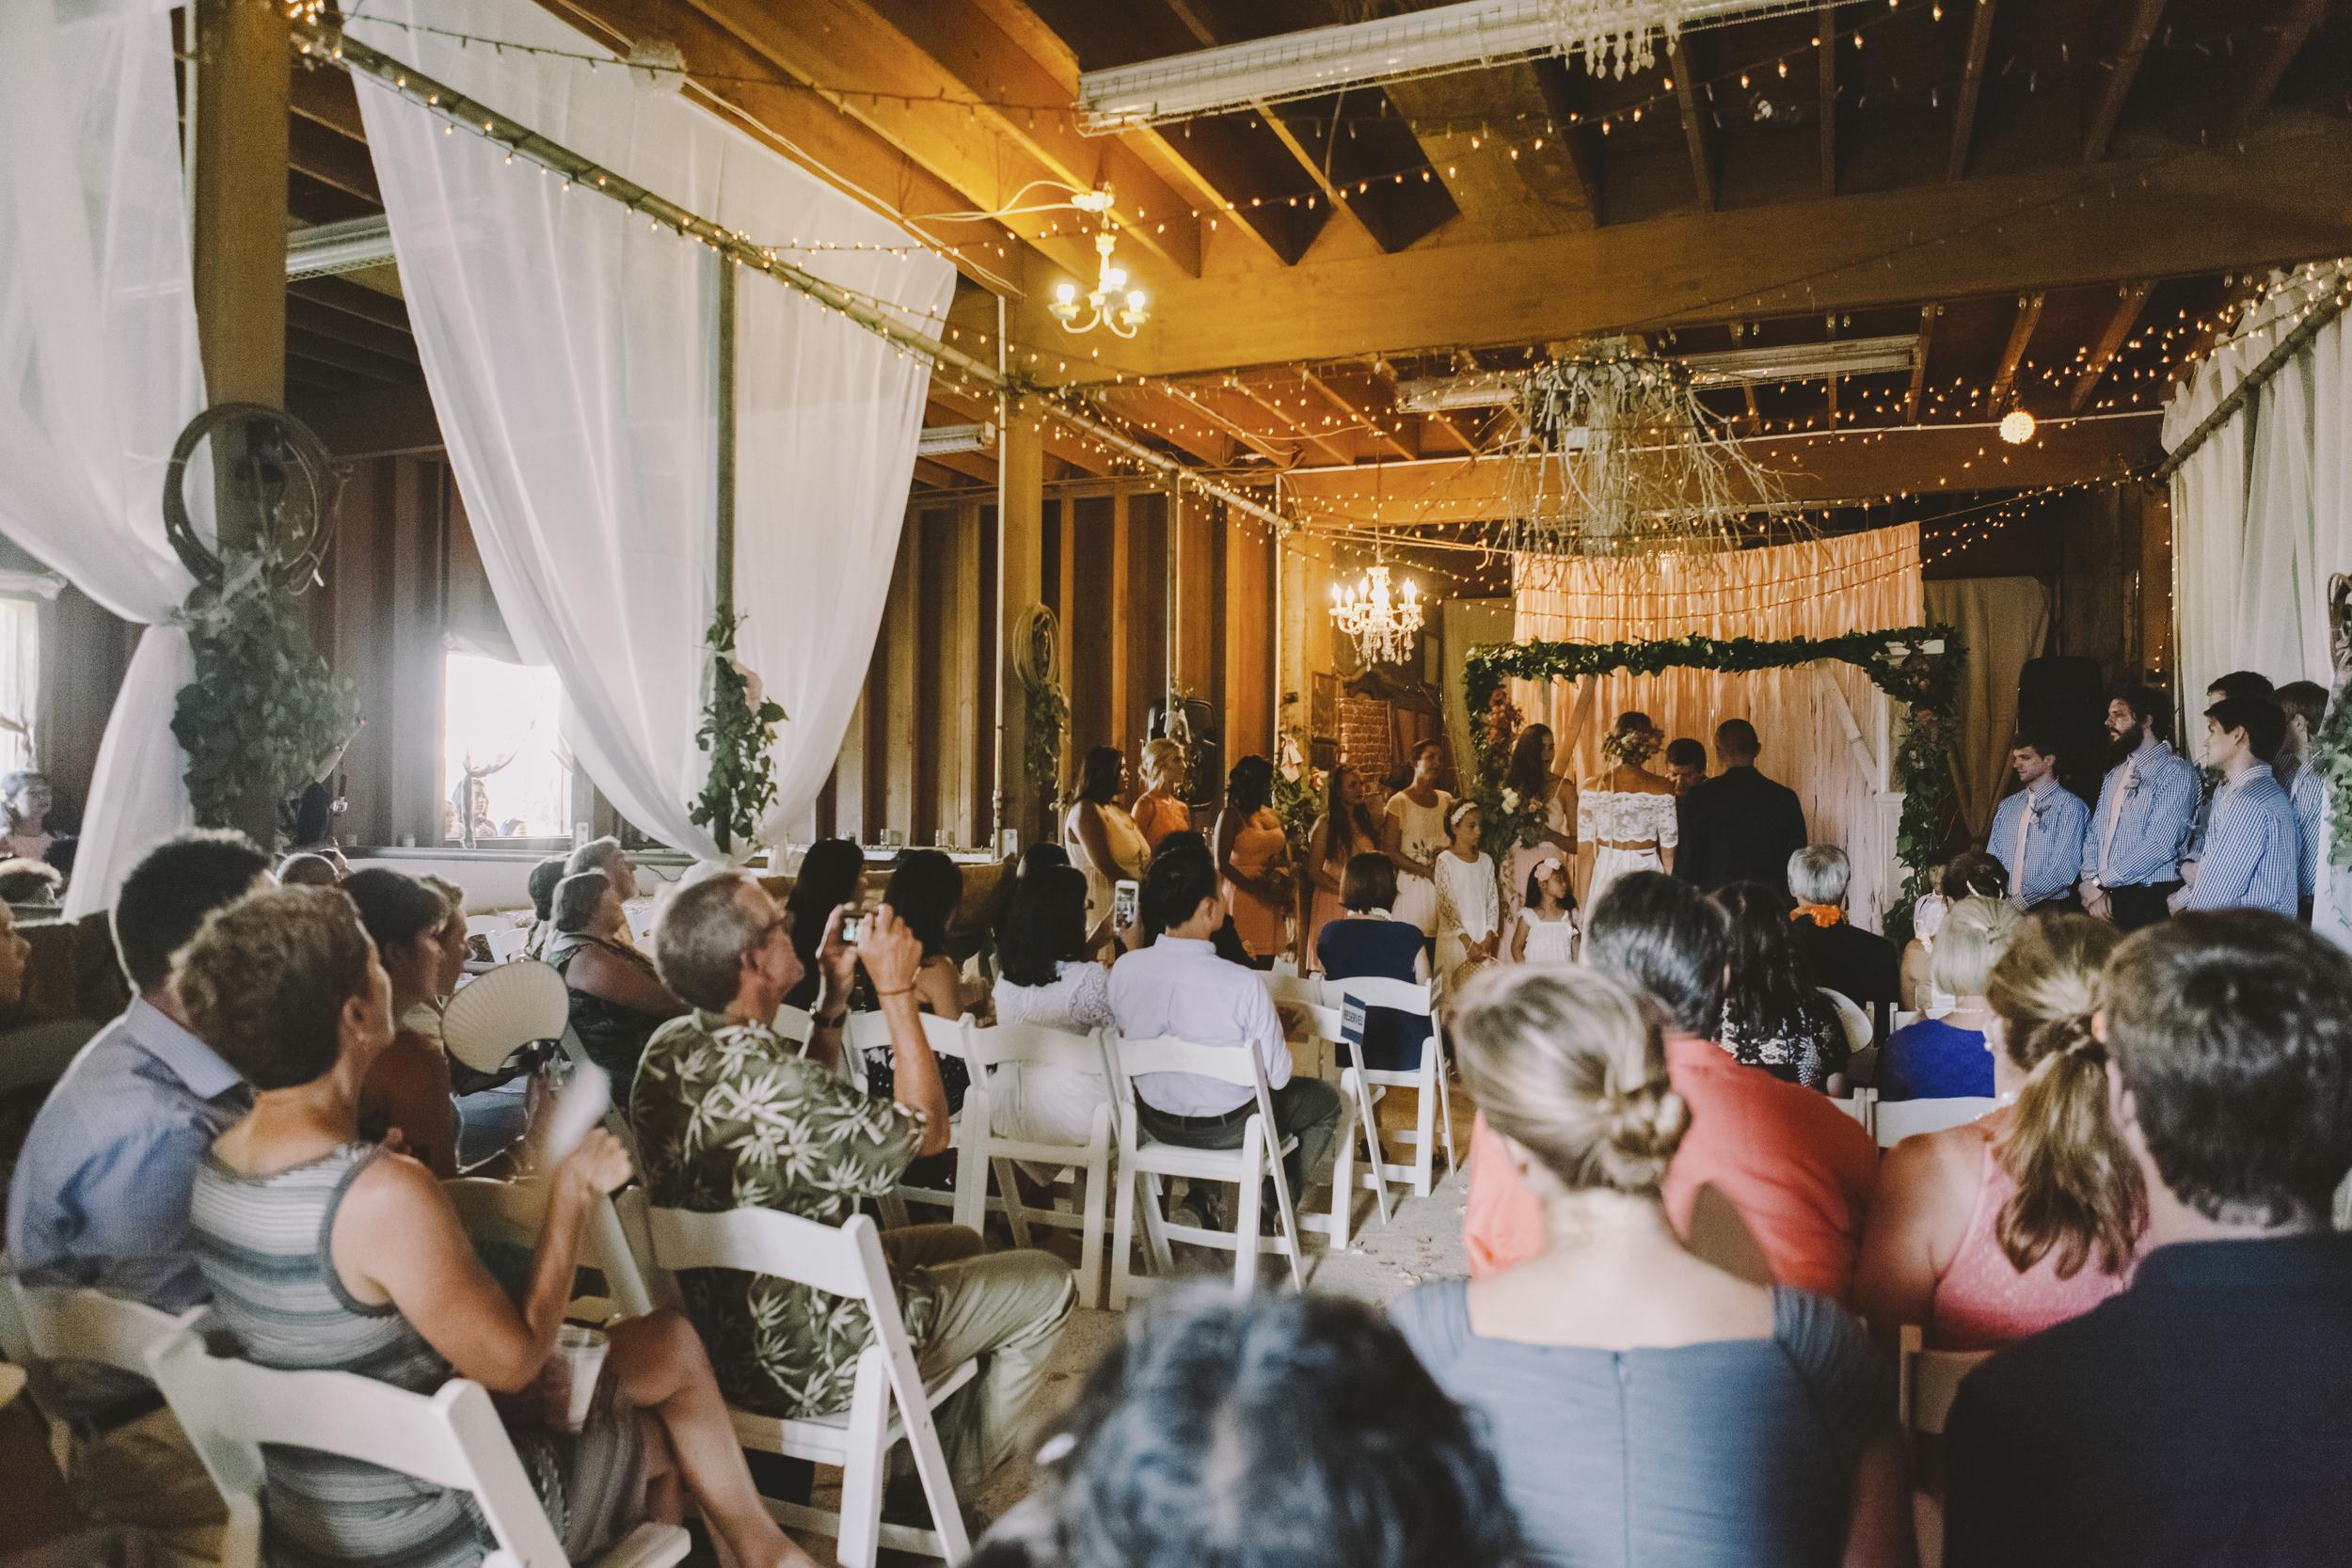 angie-diaz-photography-oahu-hawaii-wedding-tradewinds-ranch-57.jpg